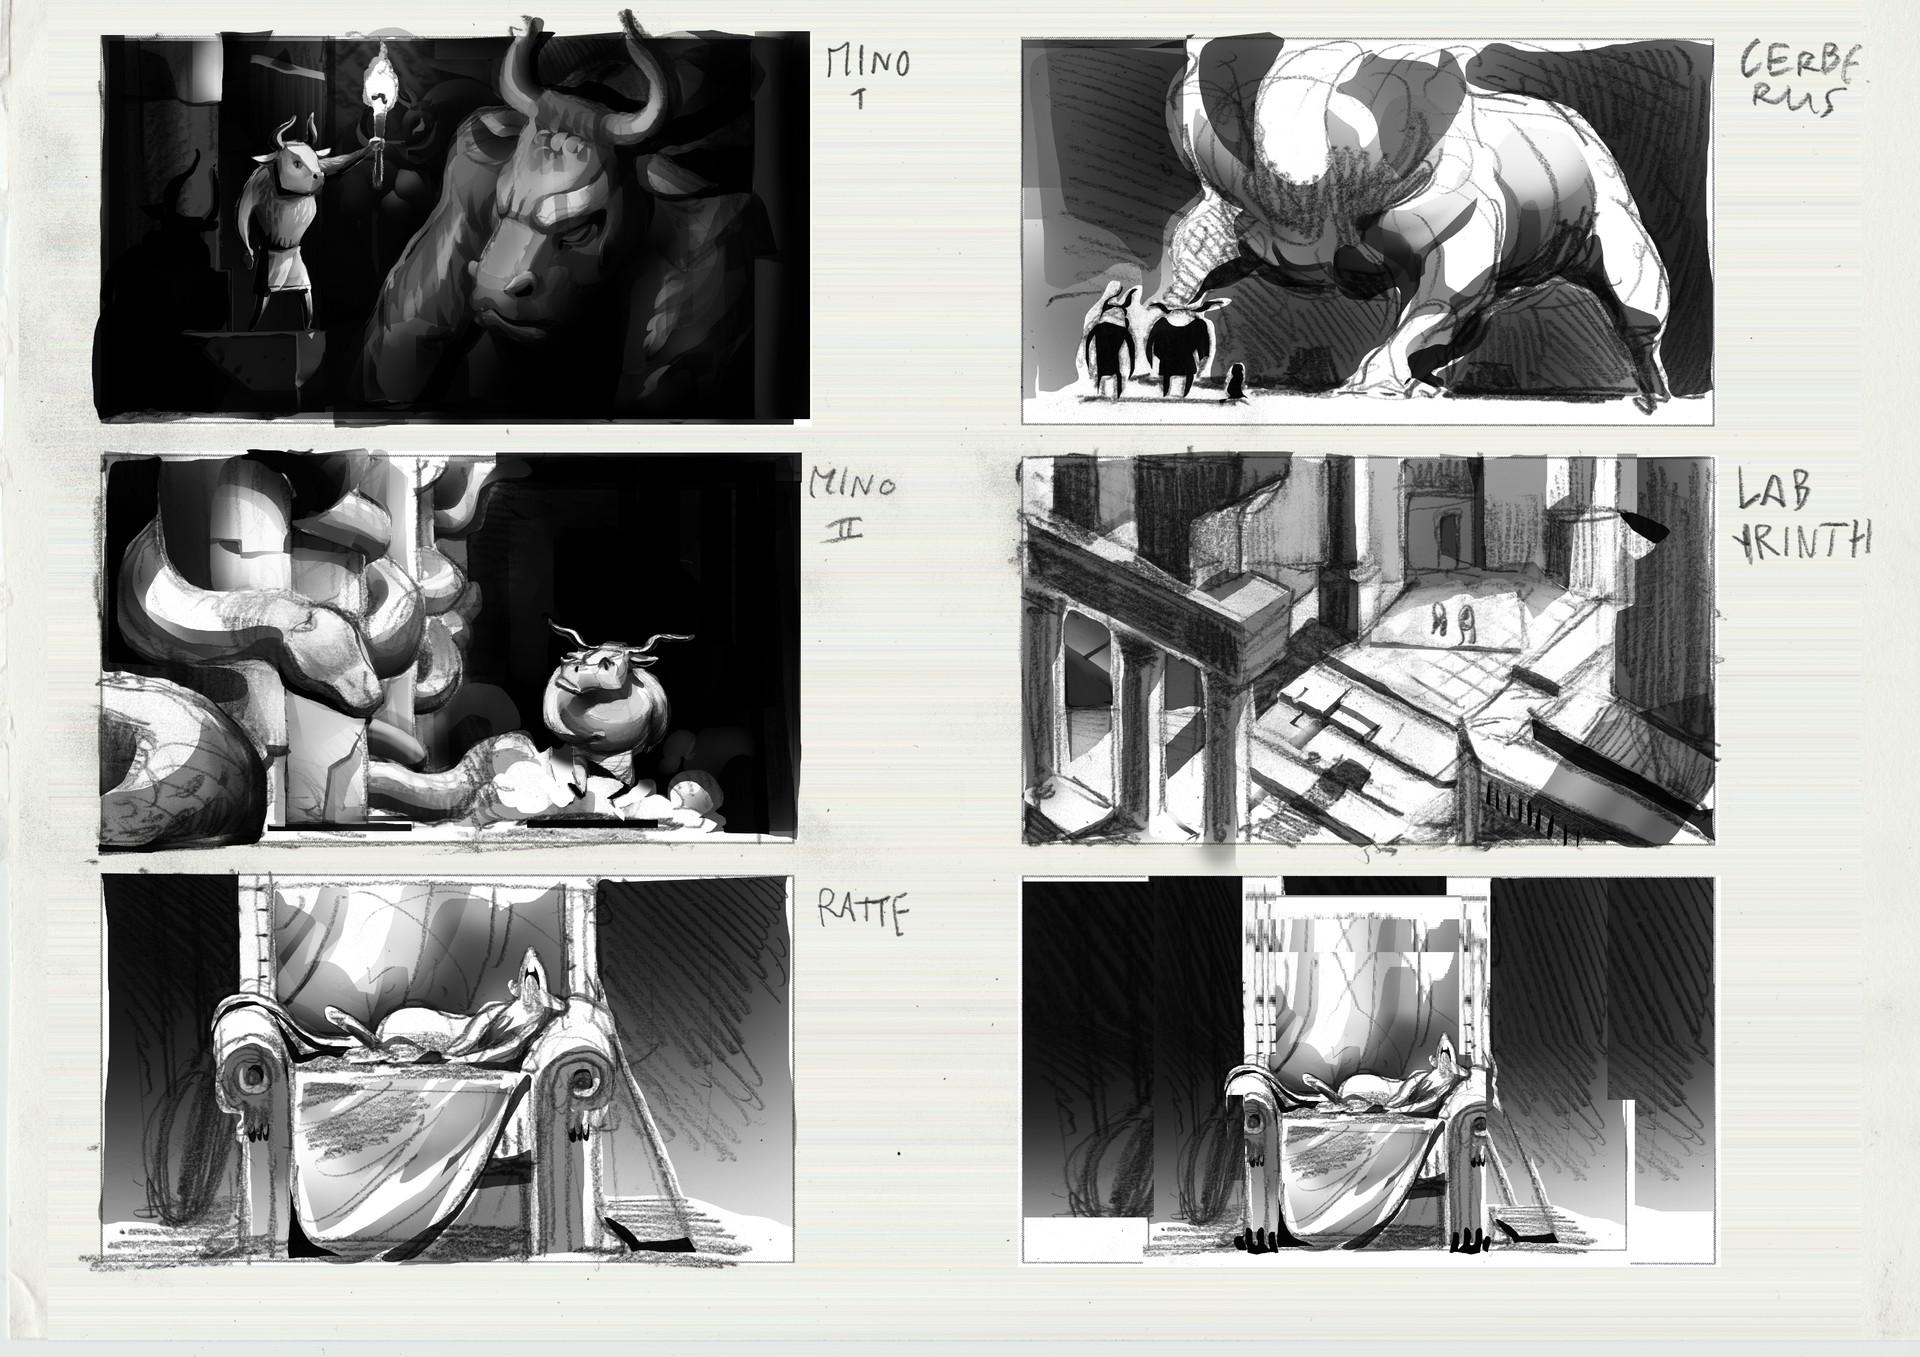 Fabian golz addiationalillustrationssketches